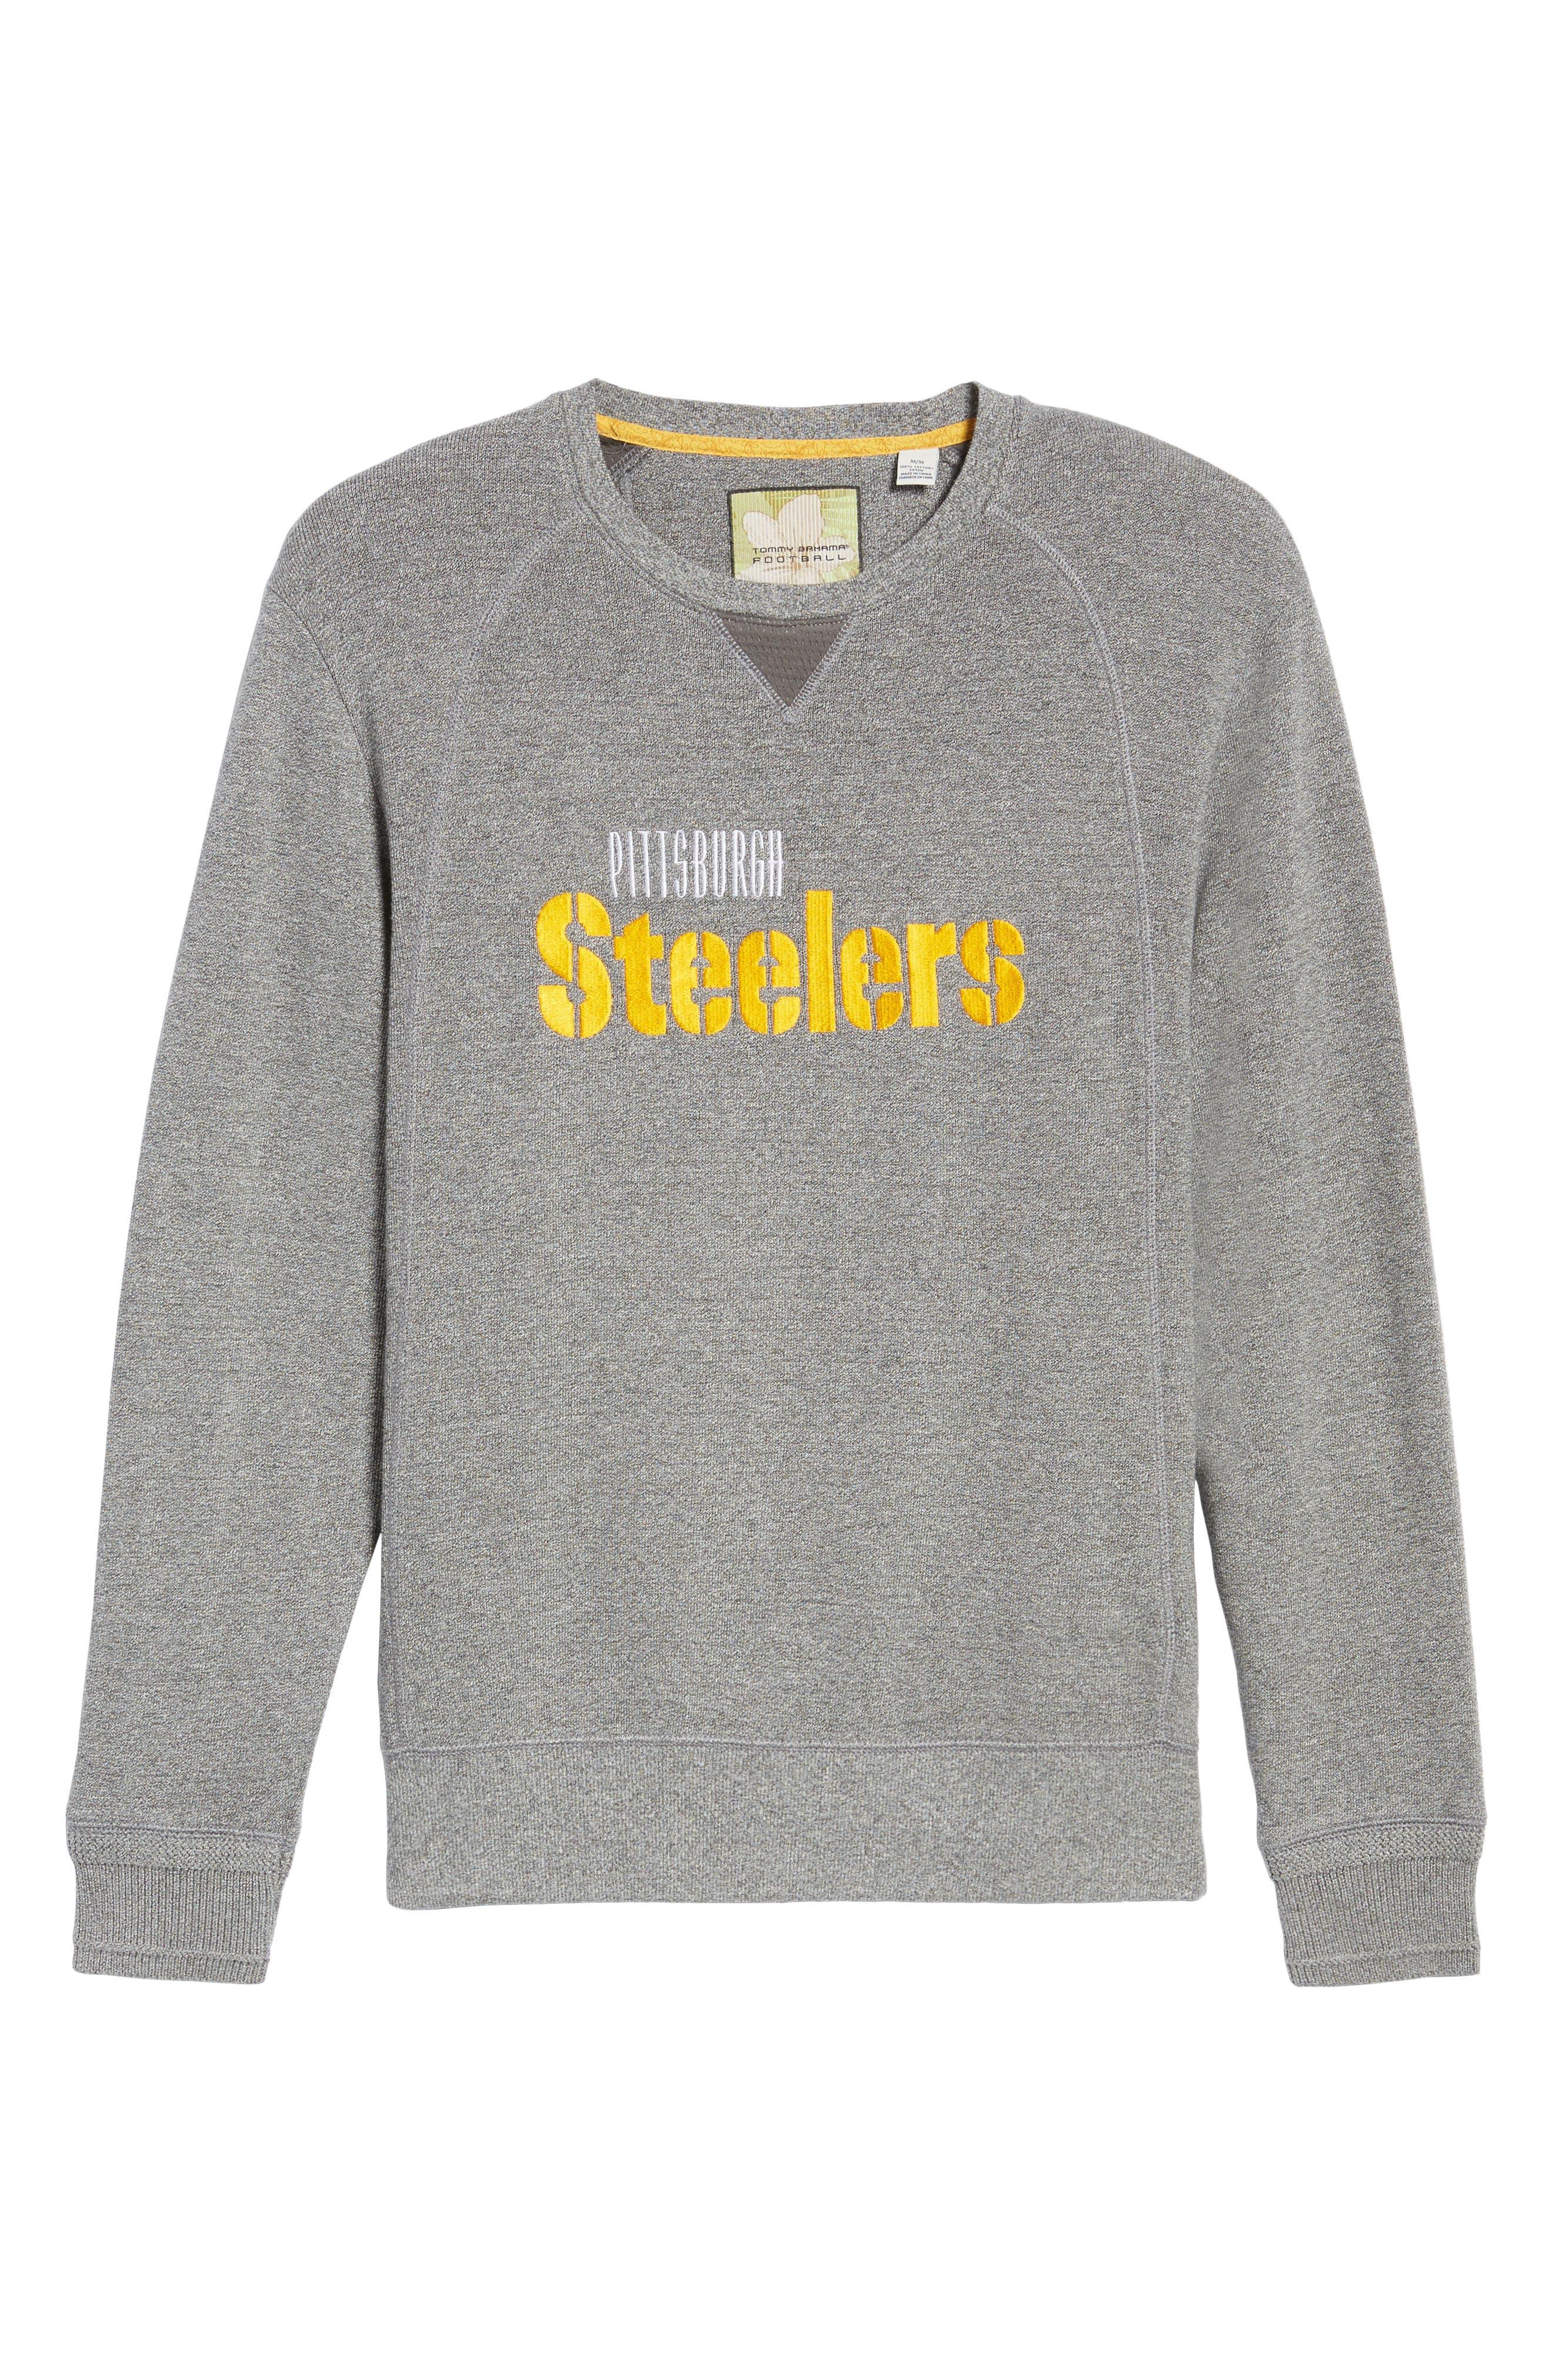 NFL Stitch of Liberty Embroidered Crewneck Sweatshirt,                             Alternate thumbnail 179, color,